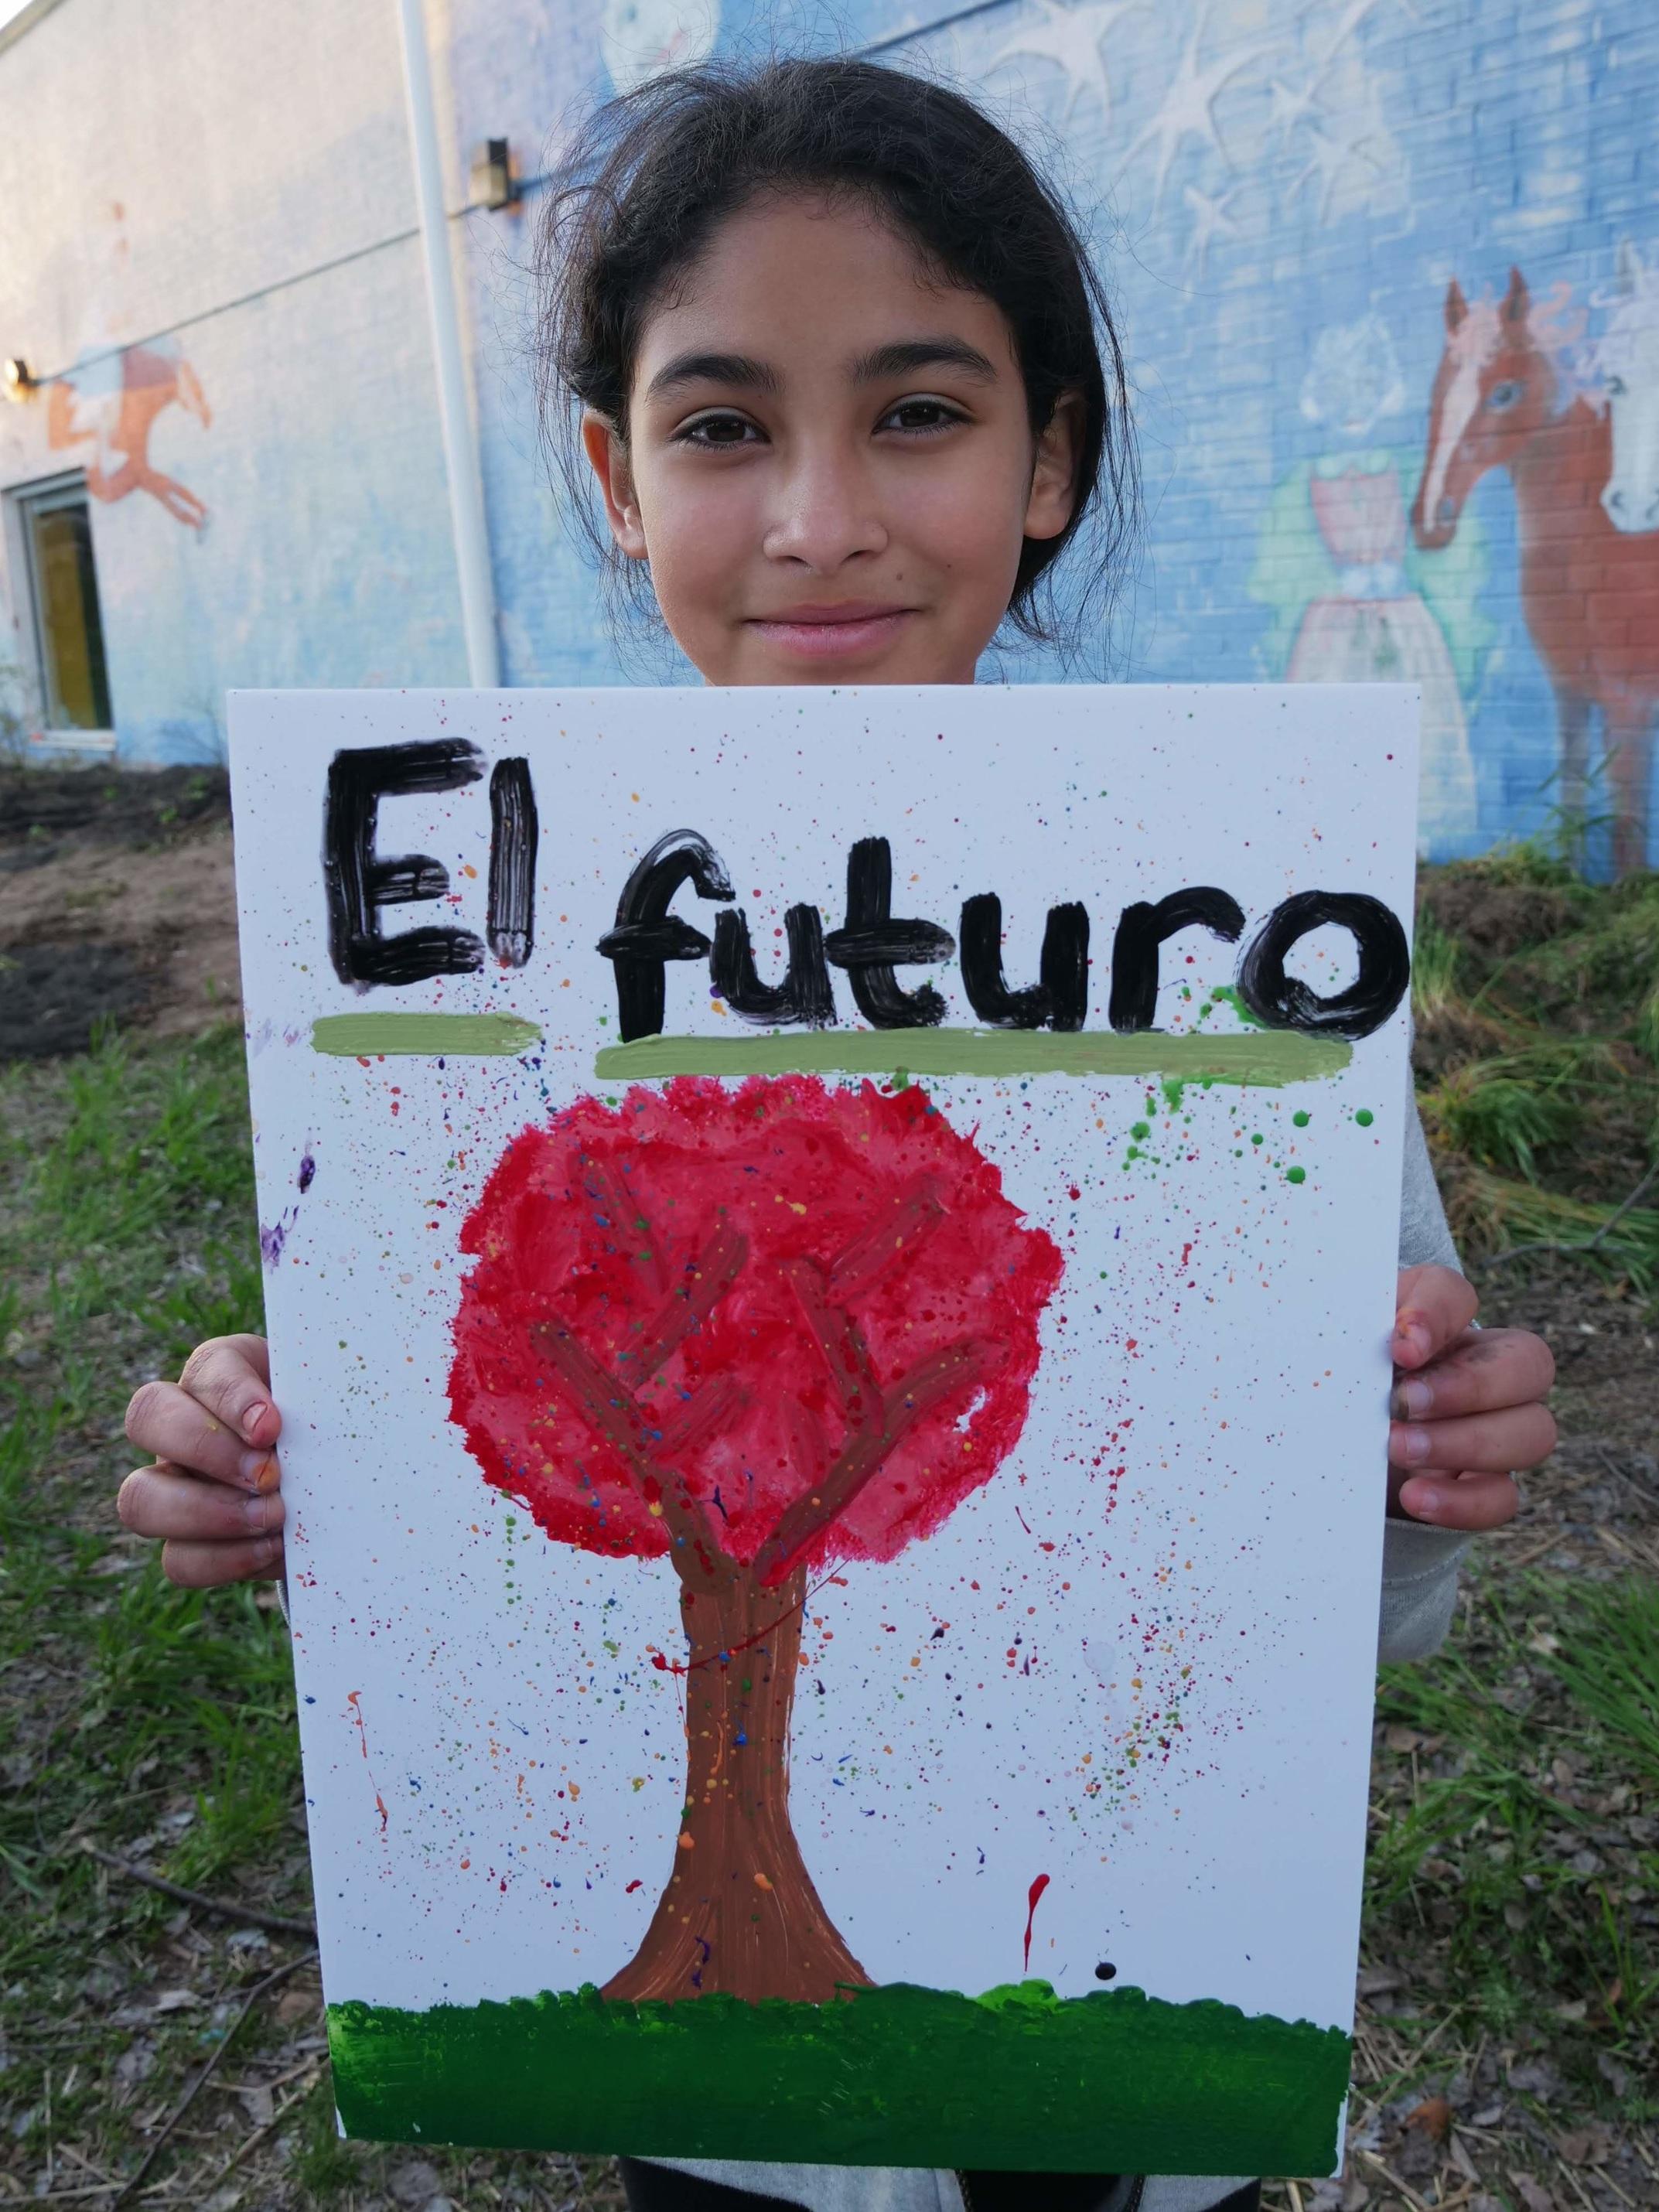 Photo courtesy of El Futuro